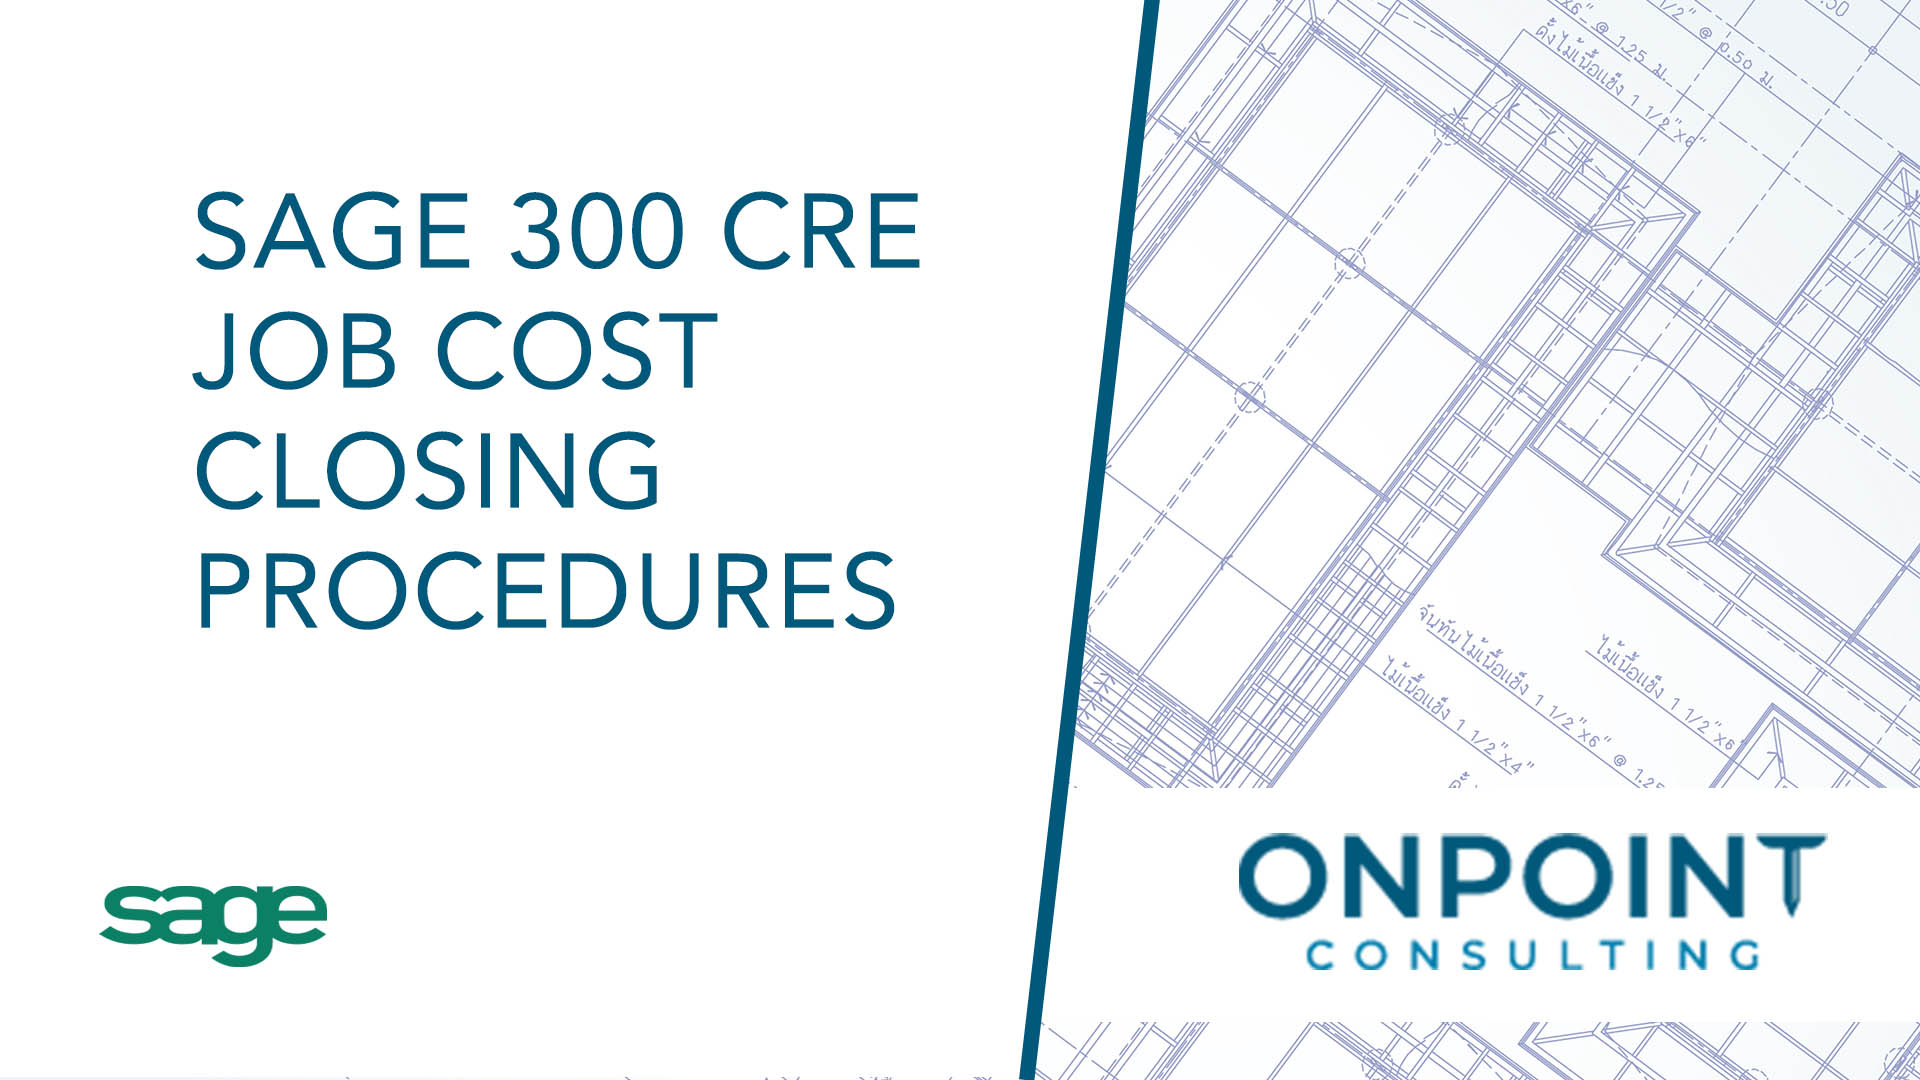 Sage 300 CRE Job Cost Closing Procedures